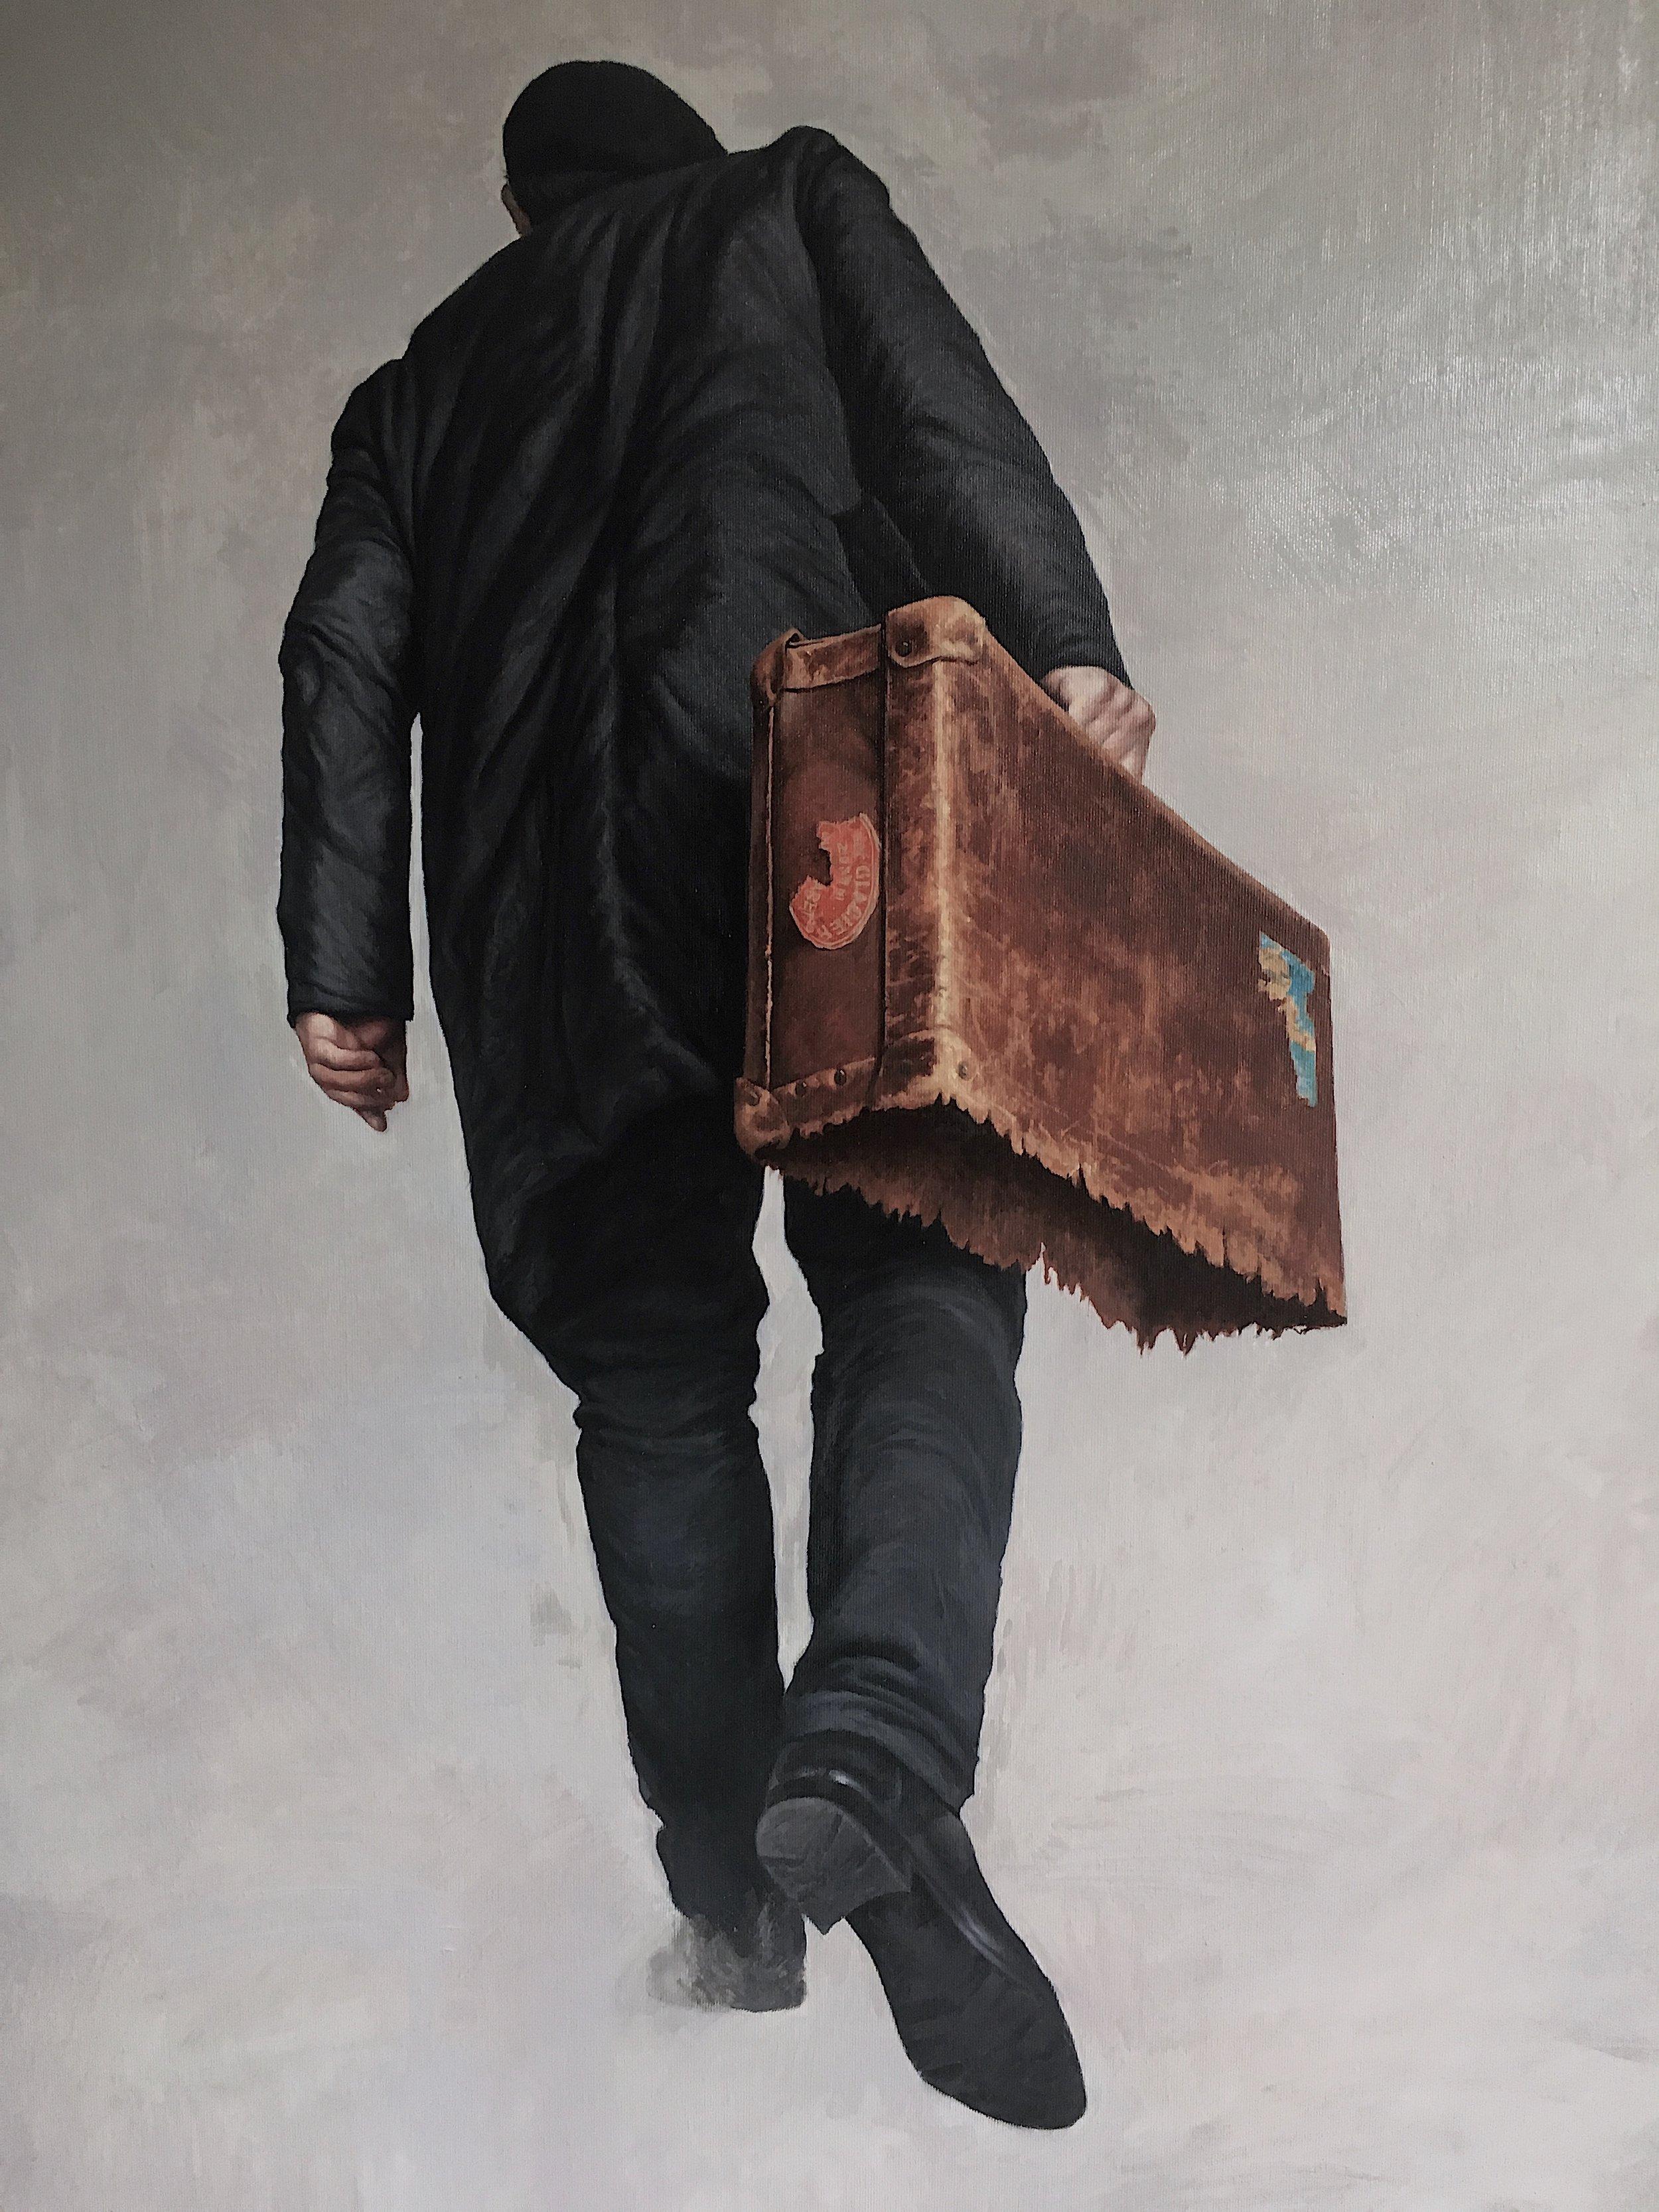 Agim Sulaj, Emigrant, Oil on Canvas, 120x80 cm,  http://www.agimsulaj.com